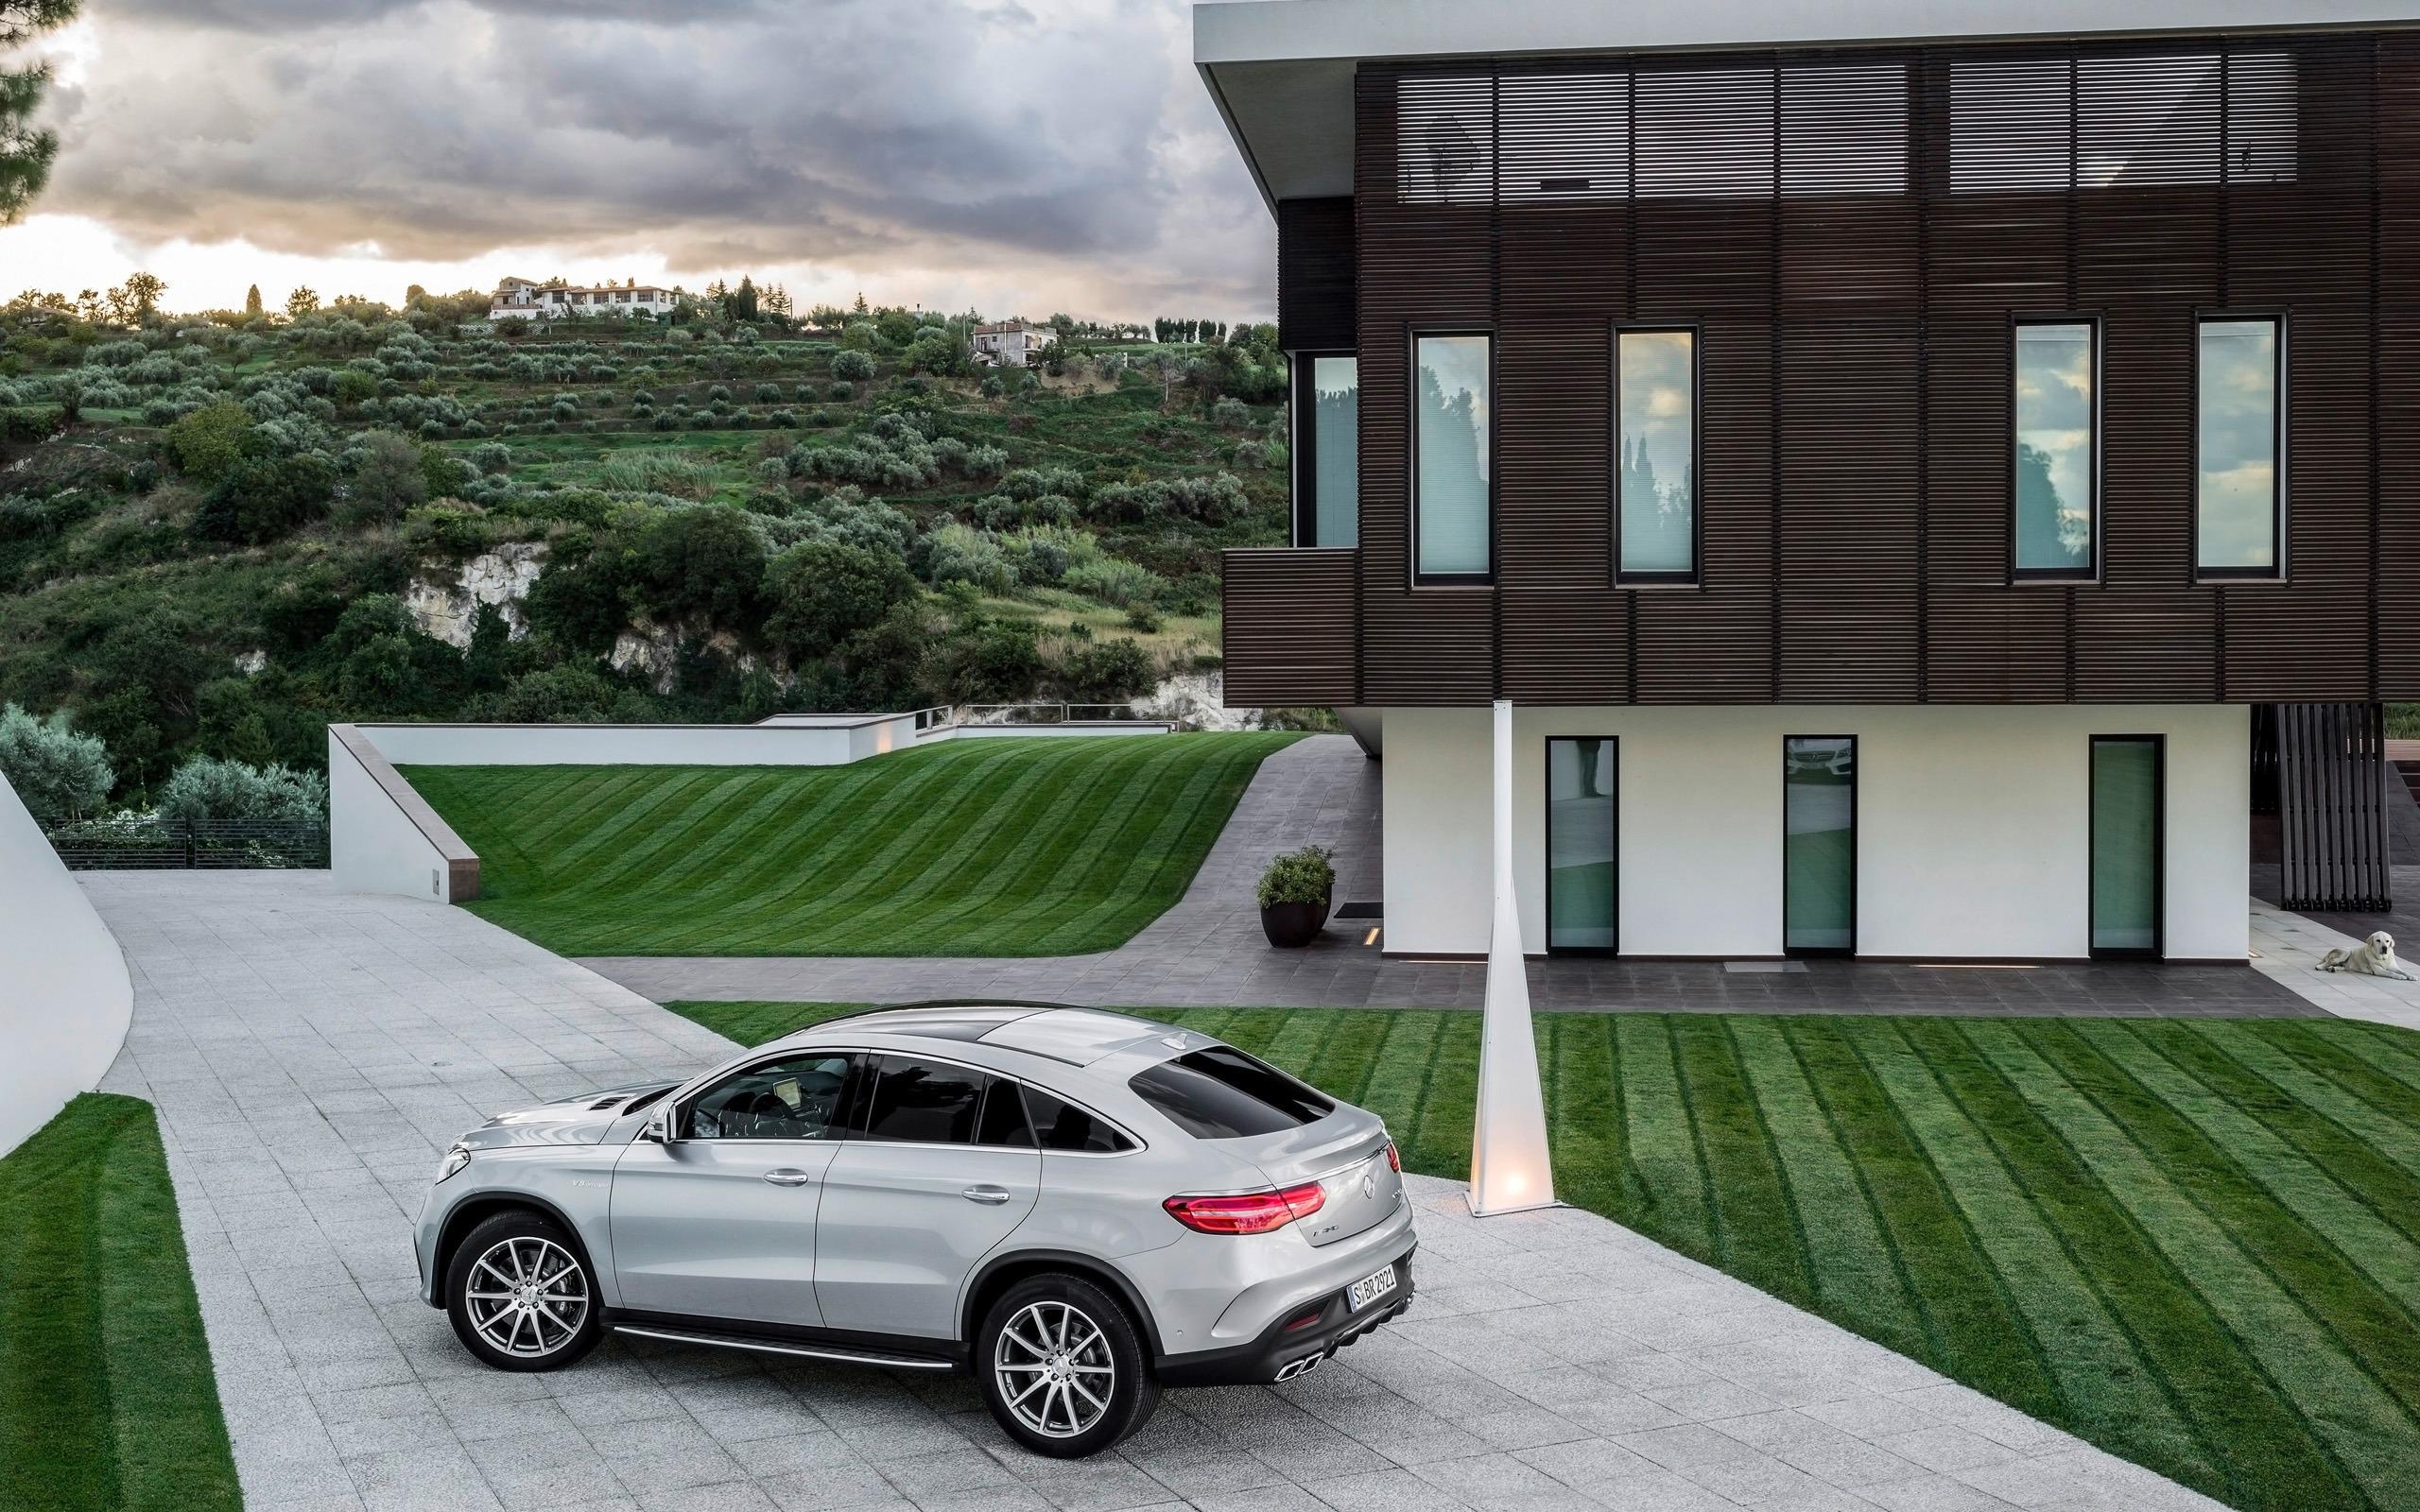 Mercedes Amg Gle 63 Coupe Auto Hd Wallpaper Visualizacao 10wallpaper Com